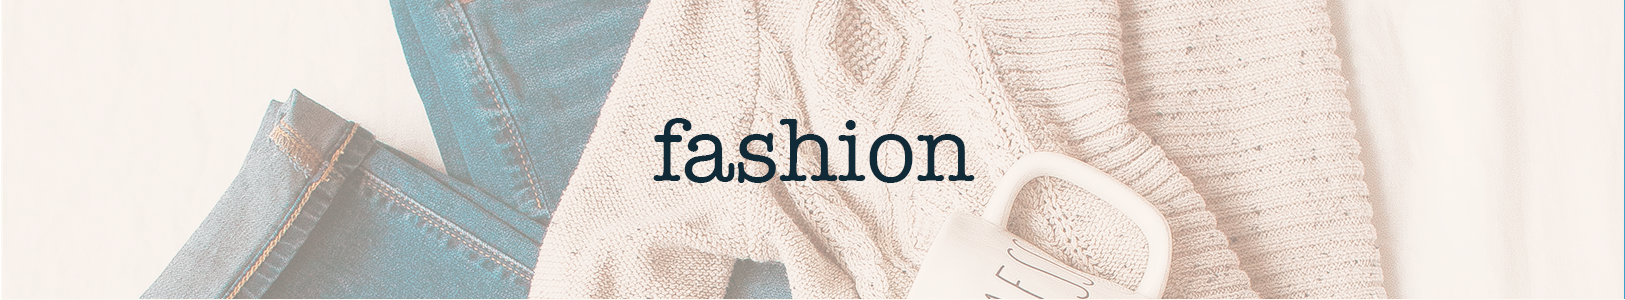 Sarah Gross Design fashion